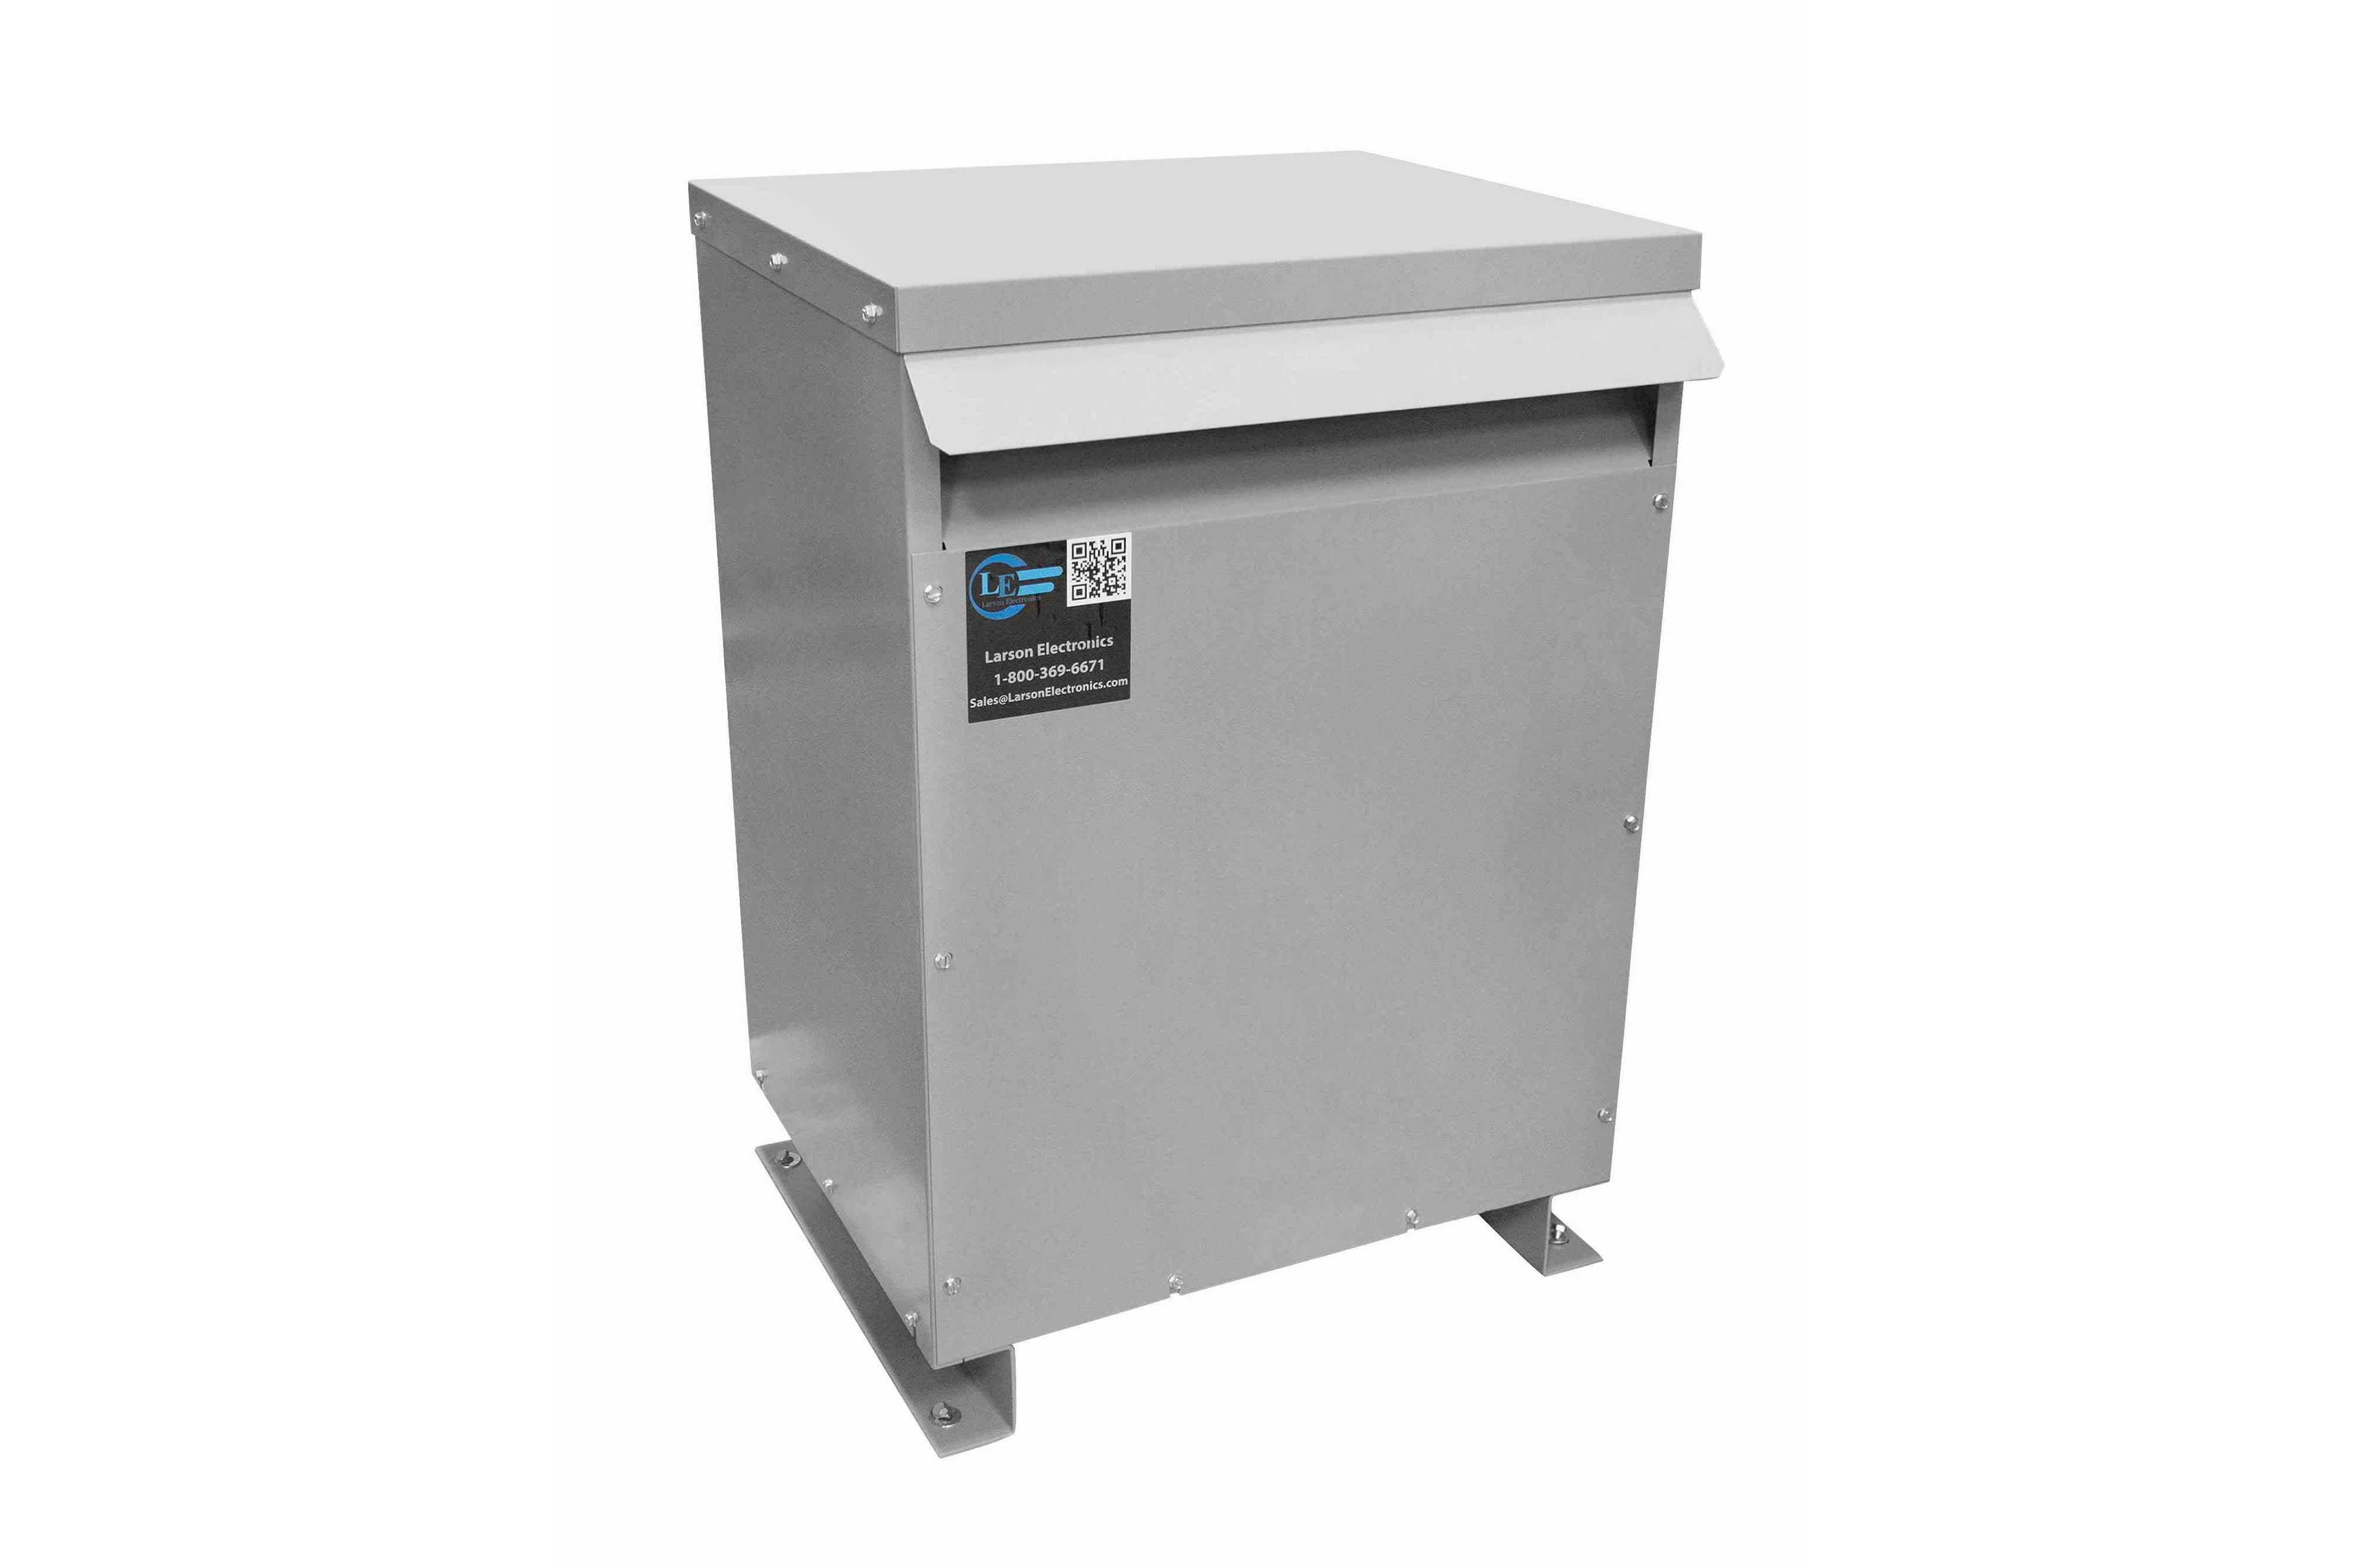 137.5 kVA 3PH Isolation Transformer, 480V Wye Primary, 480Y/277 Wye-N Secondary, N3R, Ventilated, 60 Hz